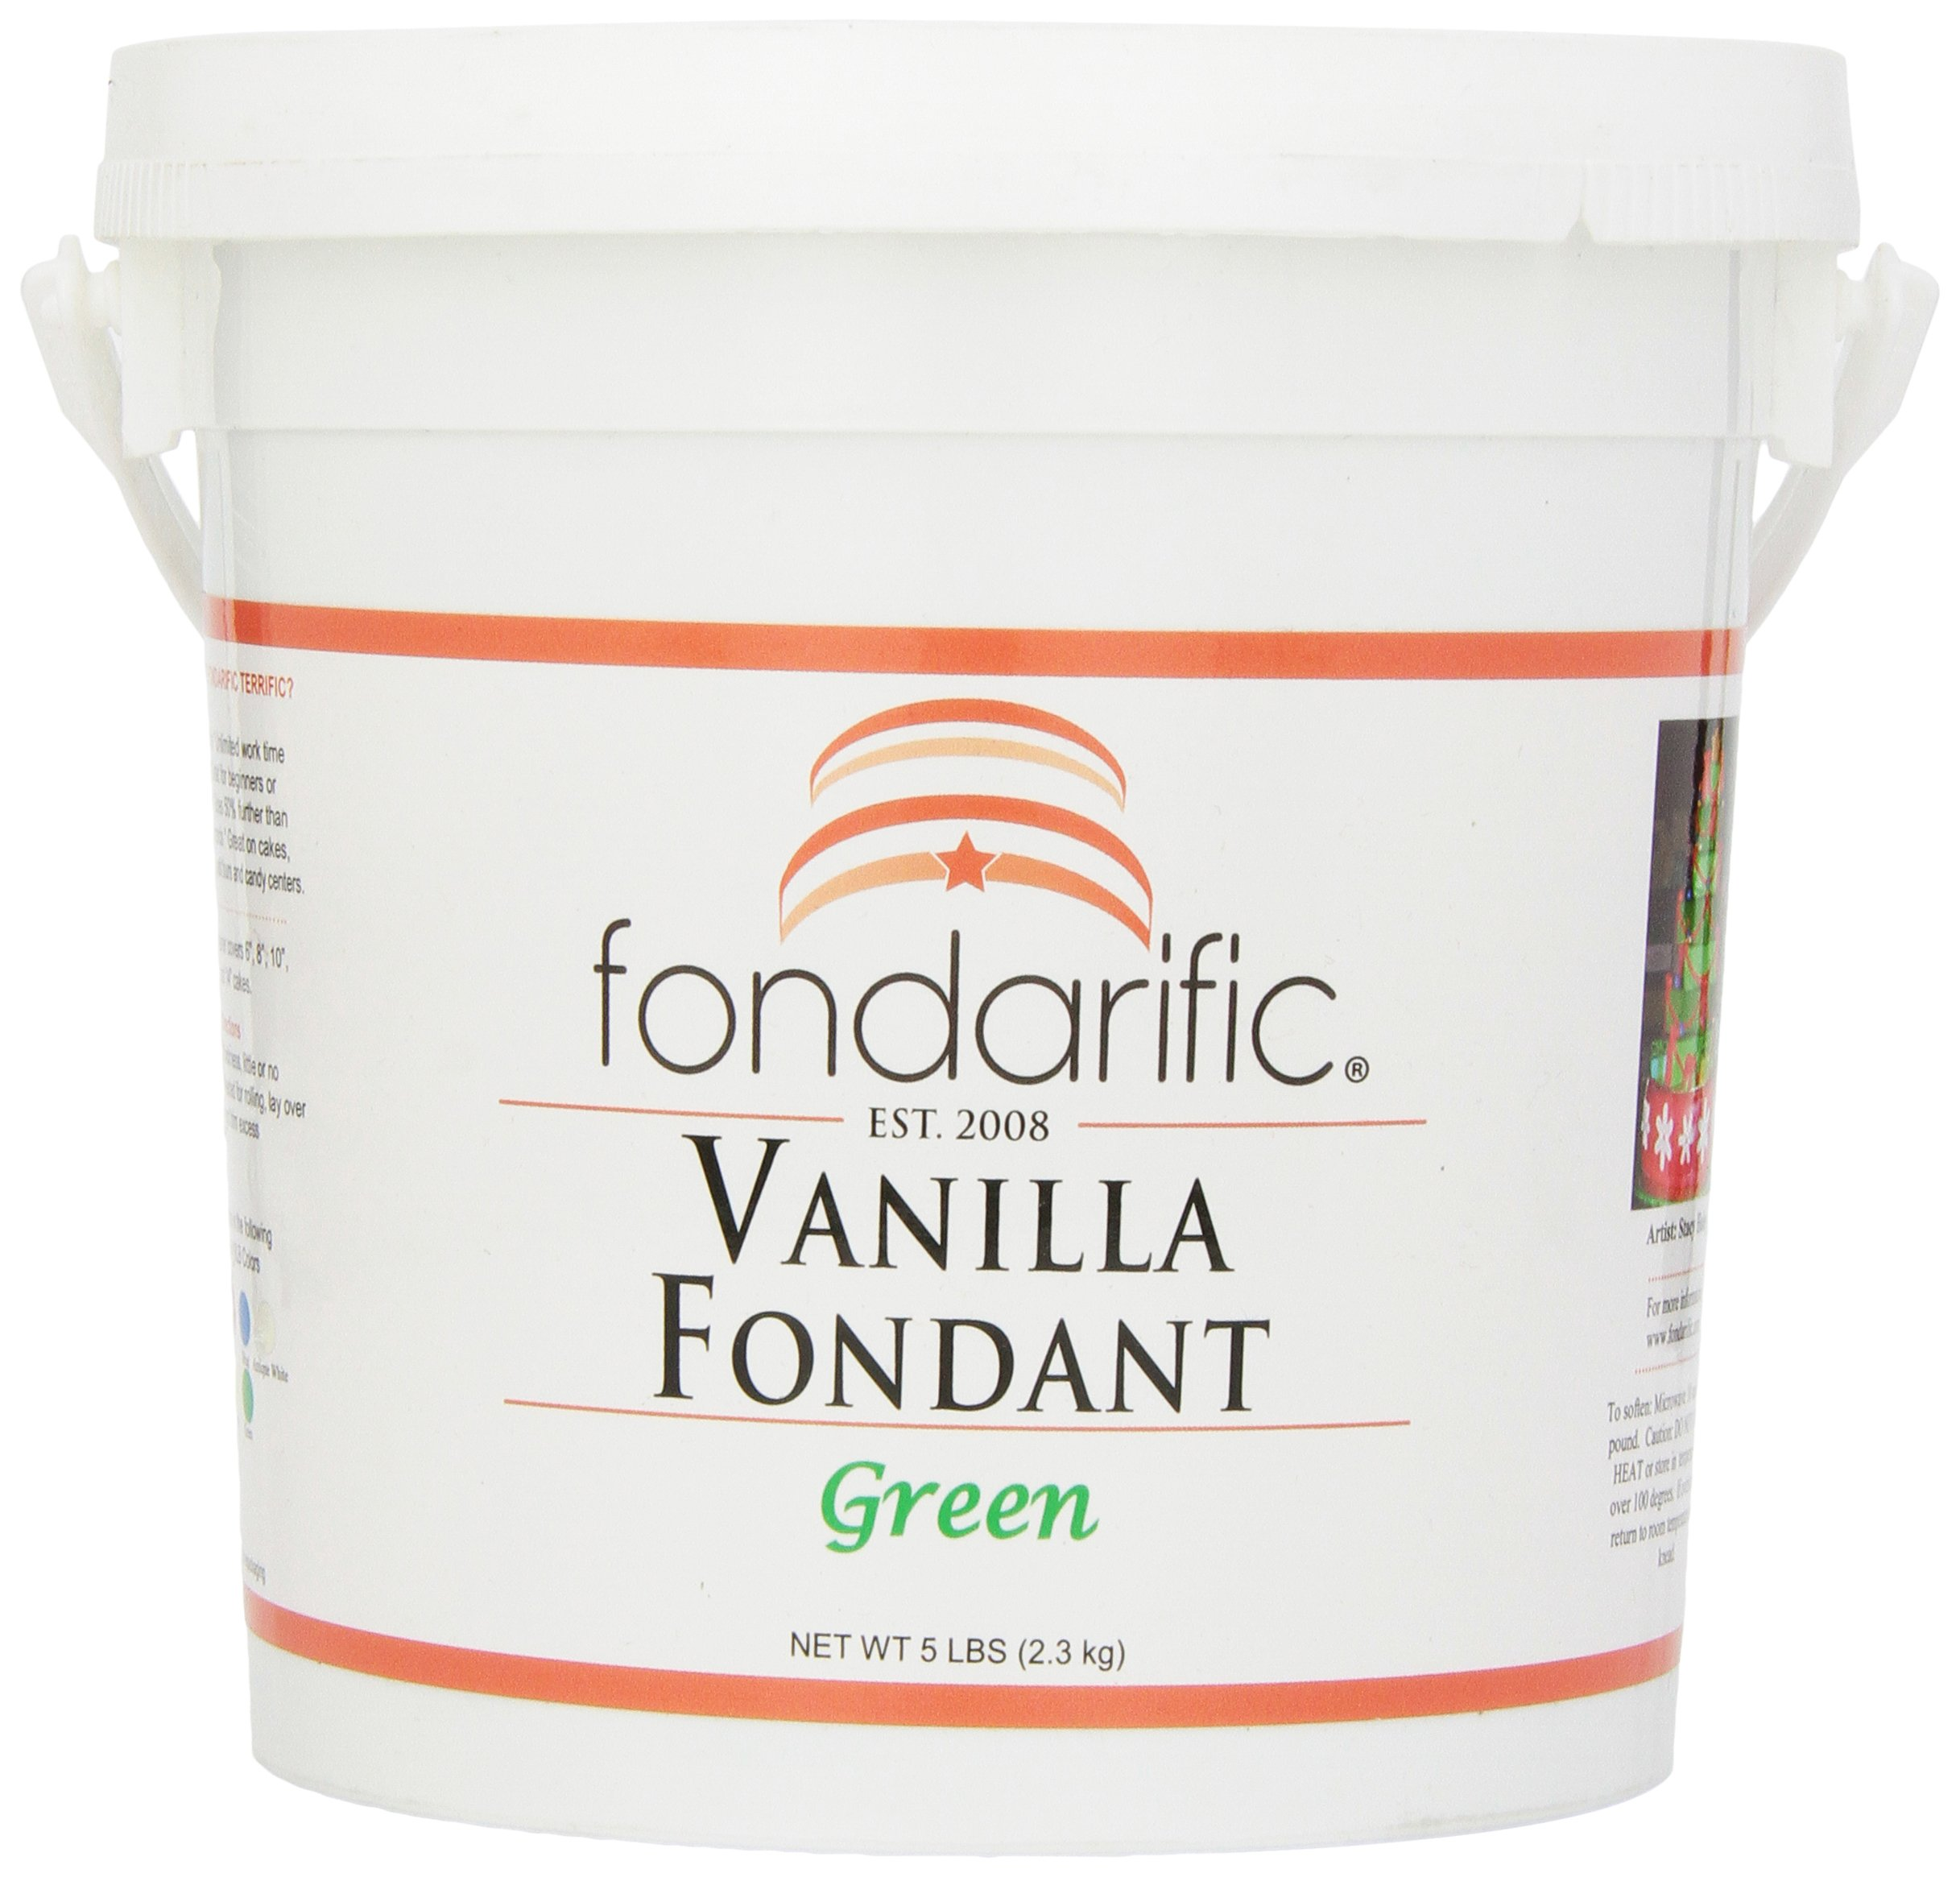 Fondarific Vanilla Green Fondant, 5-Pounds